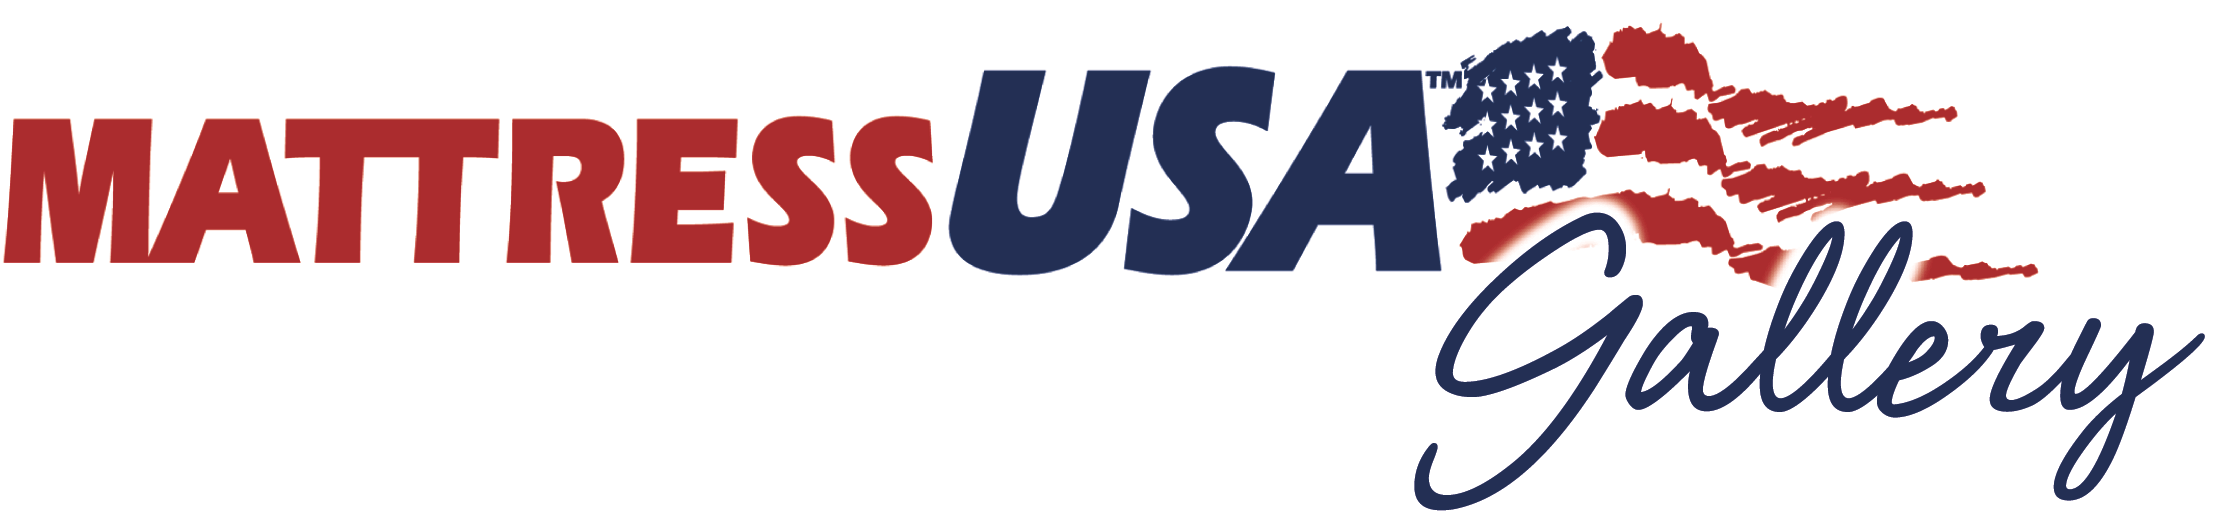 mattress king logo. Mattress USA Logo Mattress King Logo